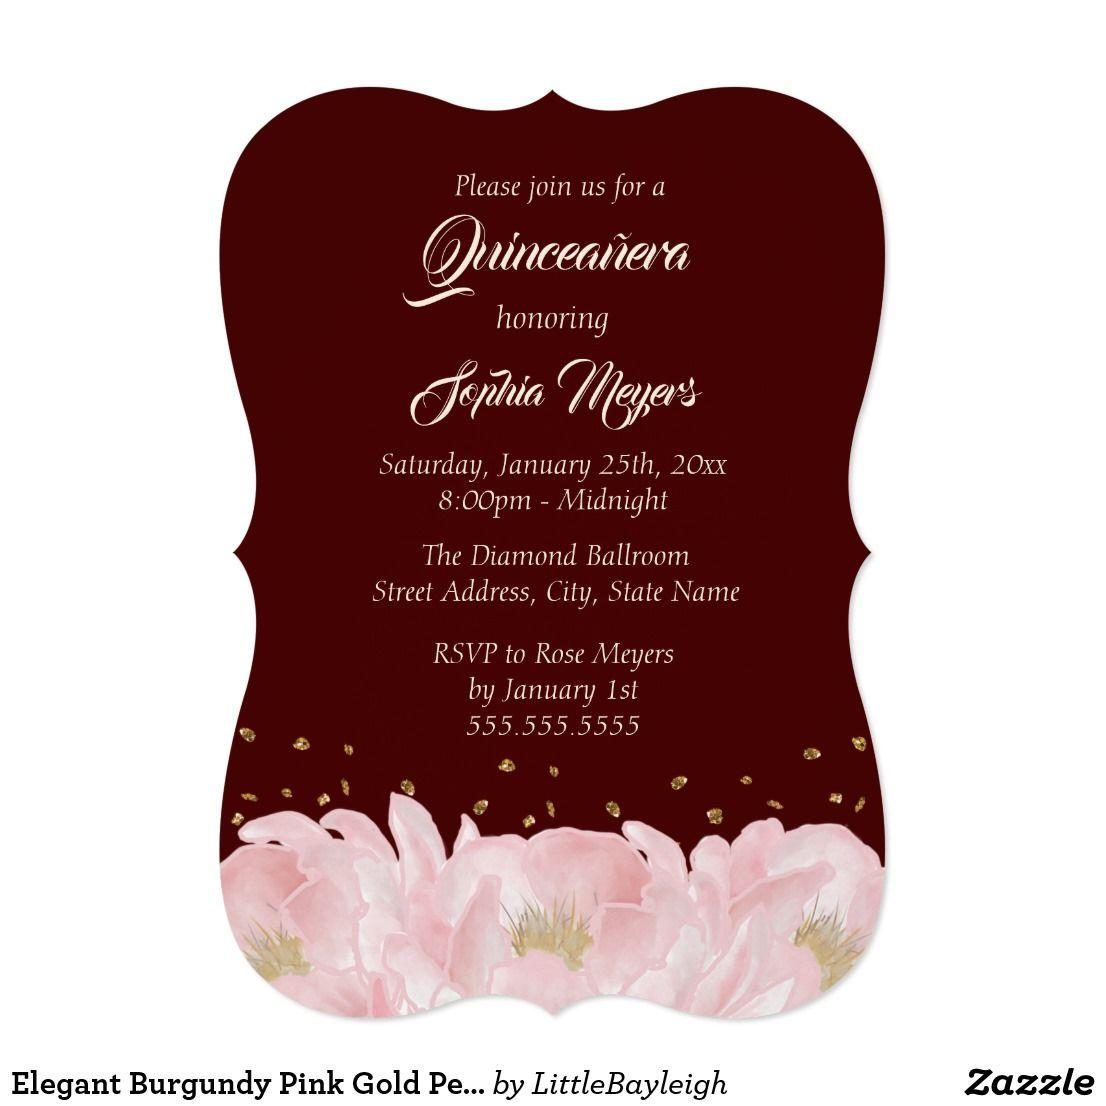 Elegant Burgundy Pink Gold Peony Quinceanera Invitation ...